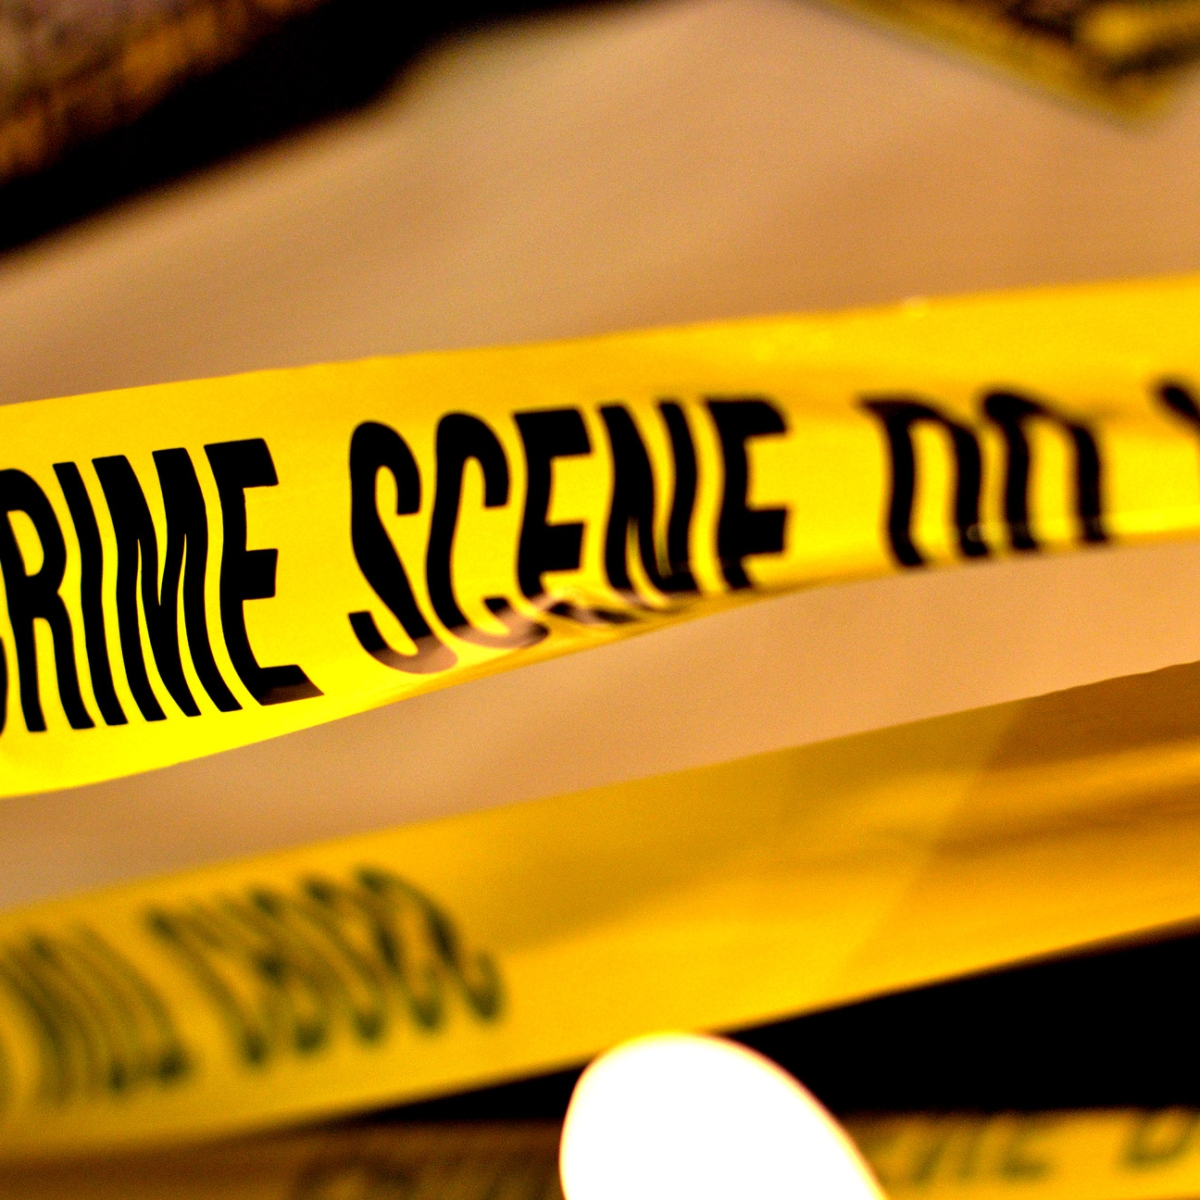 Mumbai: Juhu cops kill youth in custody, spin tale of lynching; 4 suspended